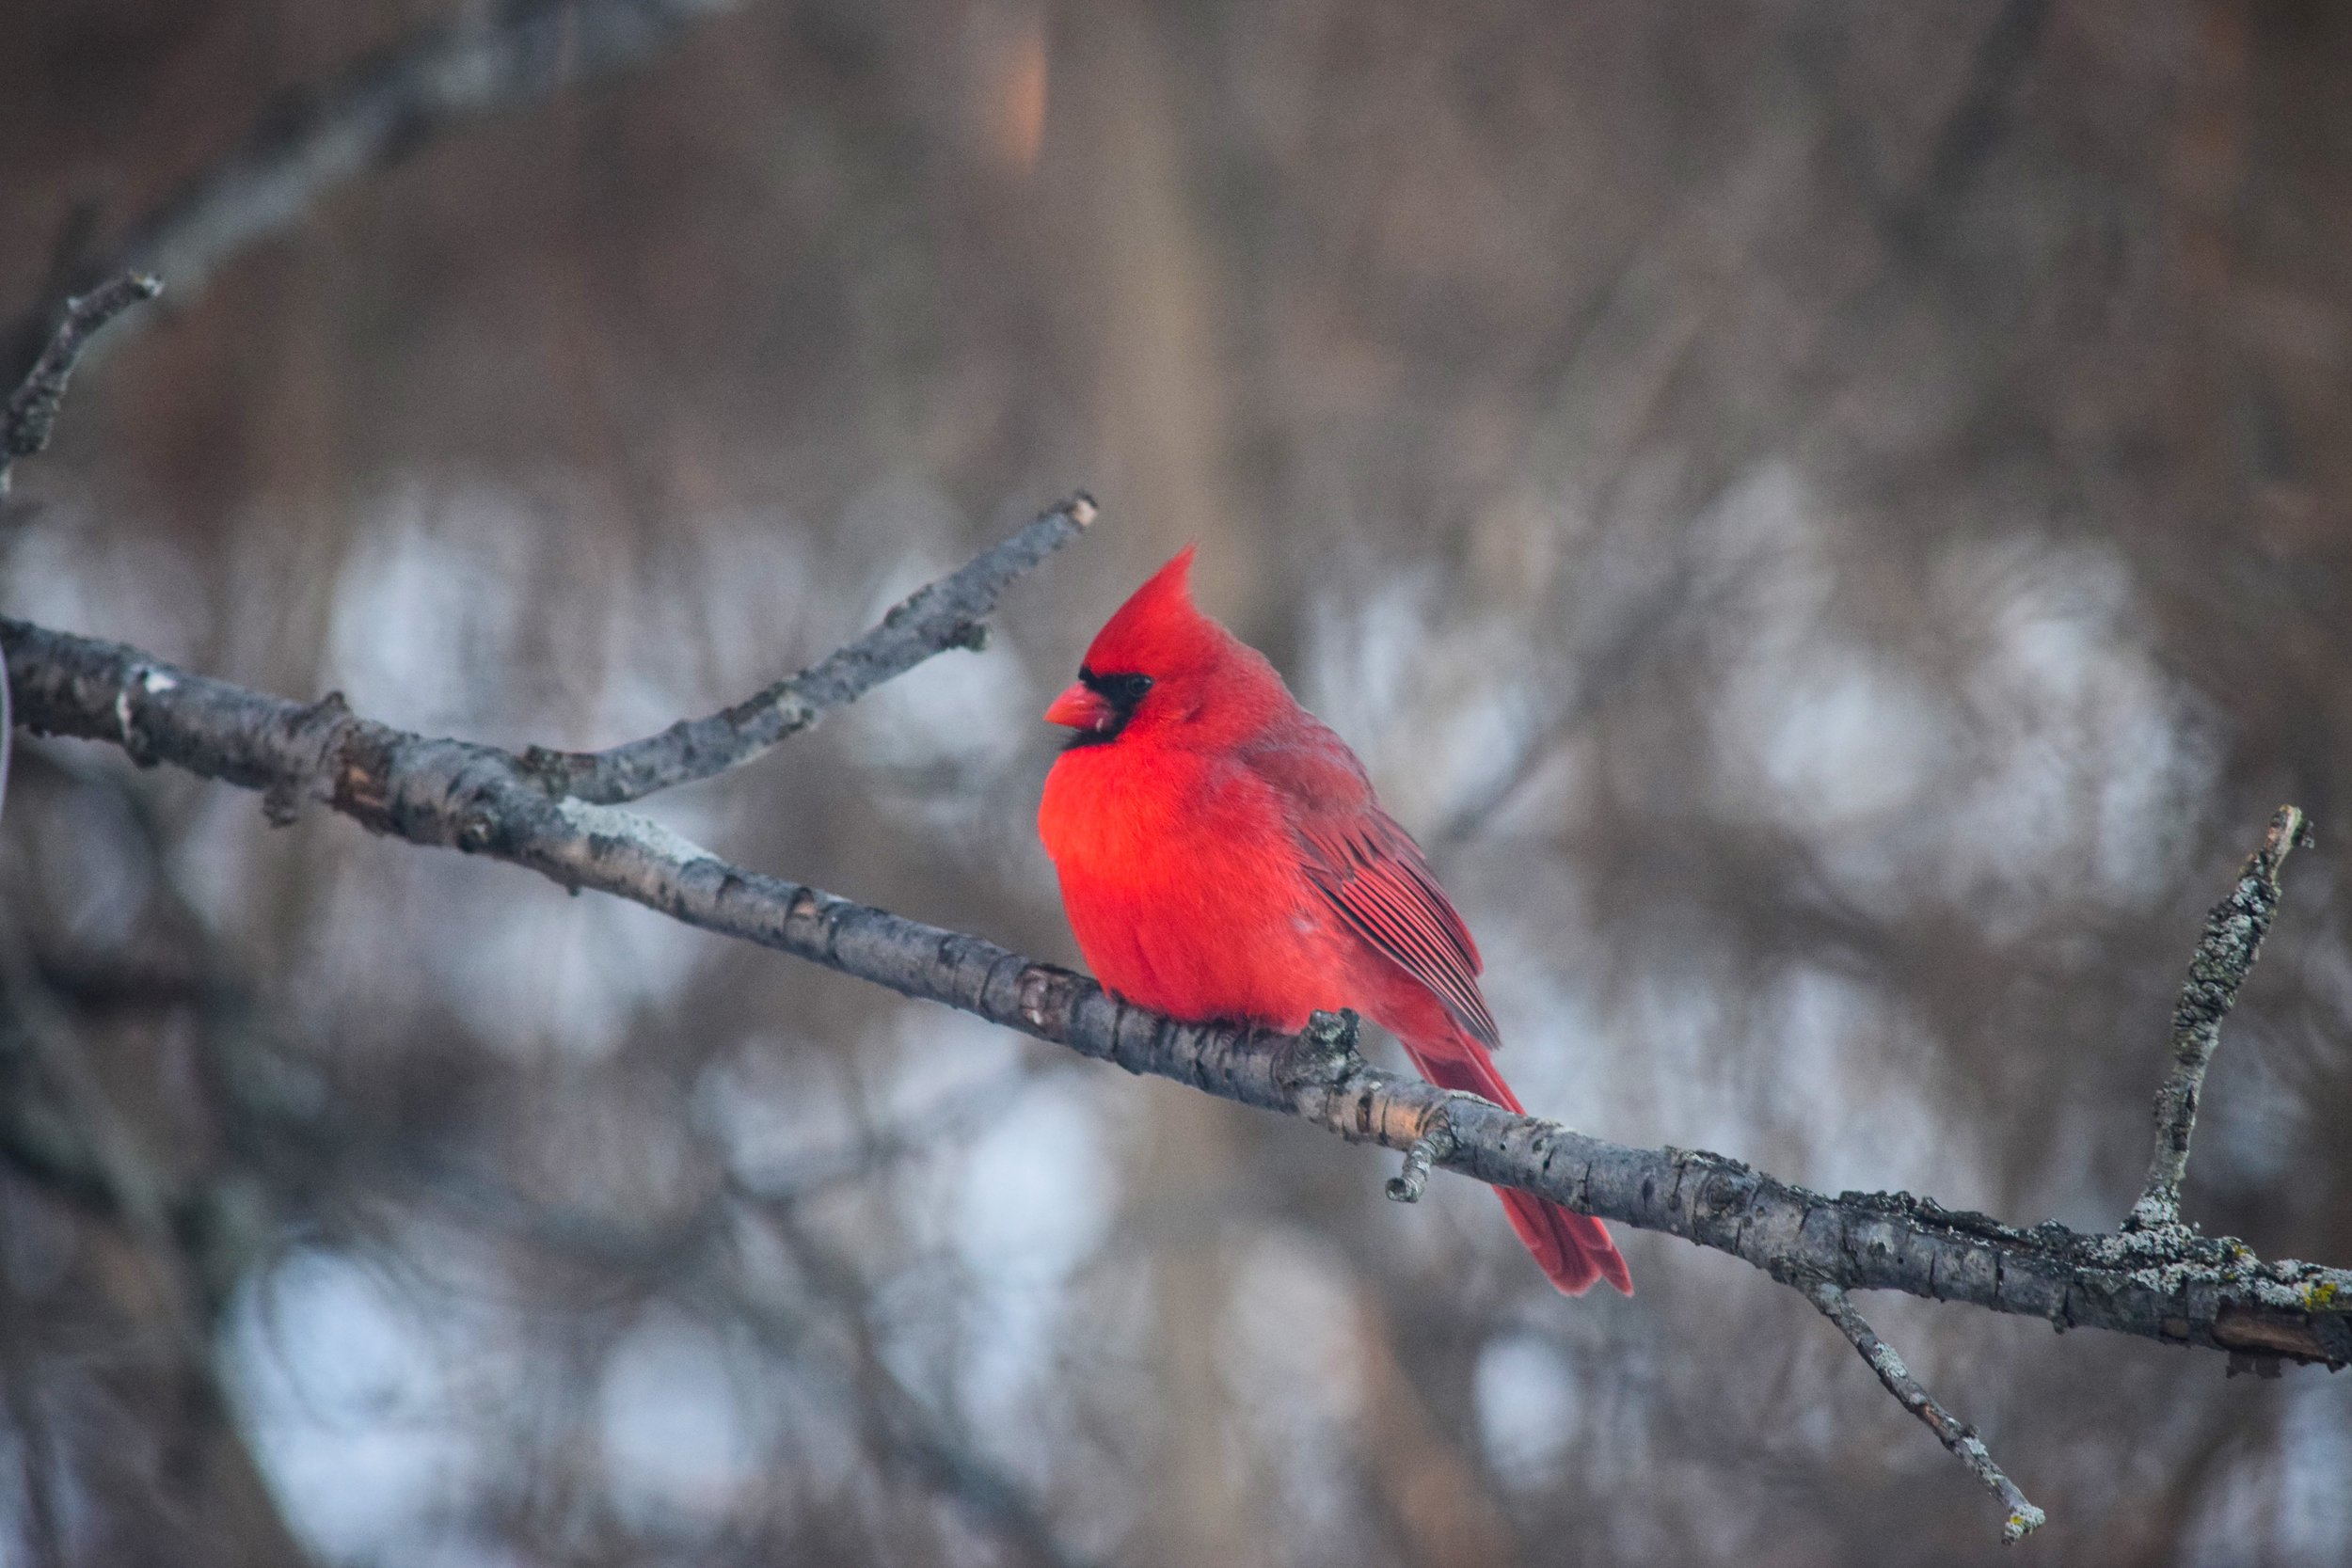 Glimsen-red-cardinal-branch.jpg